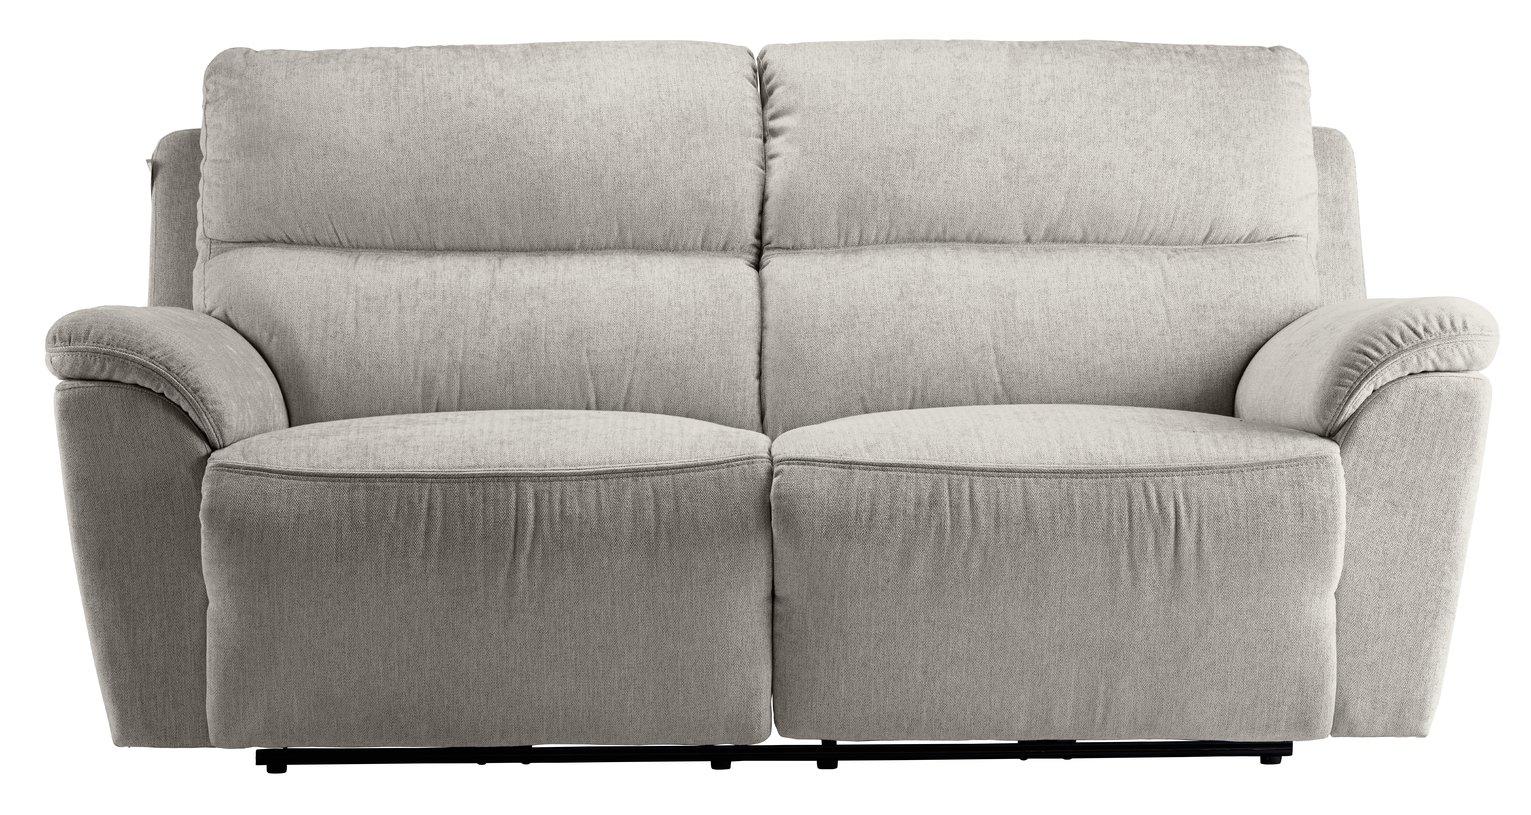 Argos Home Sandy 3 Seater Fabric Power Recliner Sofa -Silver